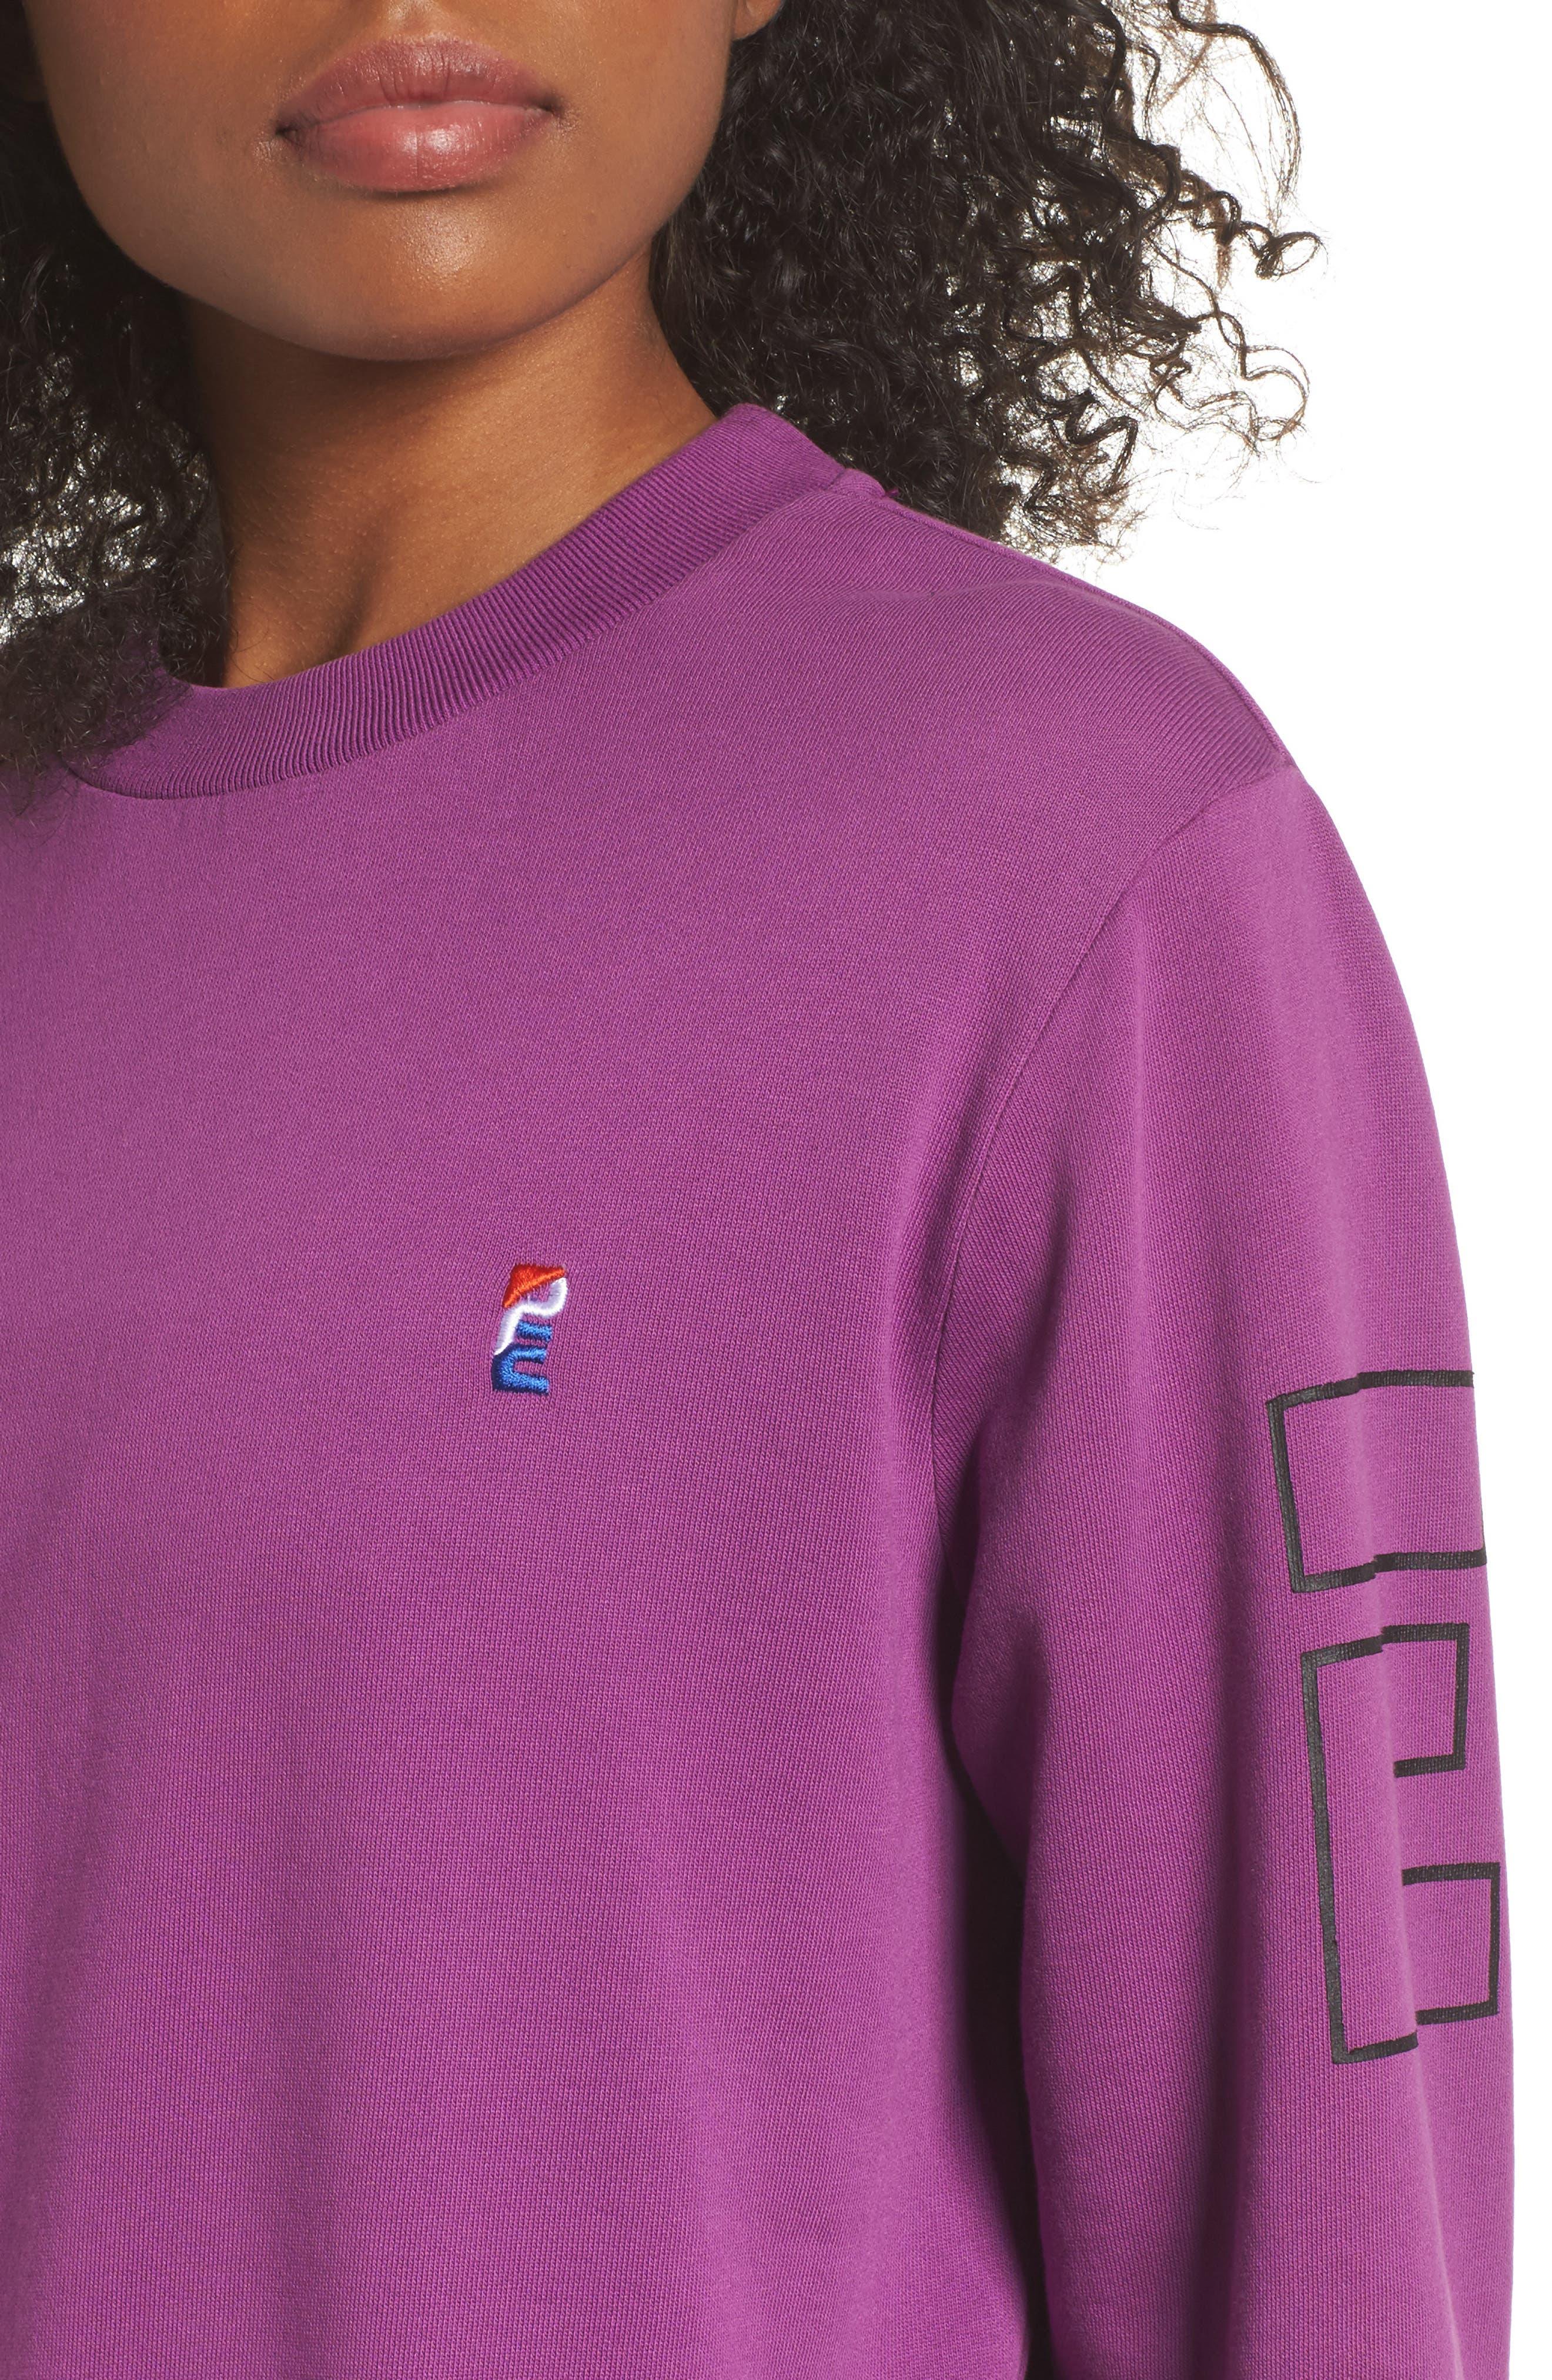 Moneyball Sweatshirt,                             Alternate thumbnail 4, color,                             500